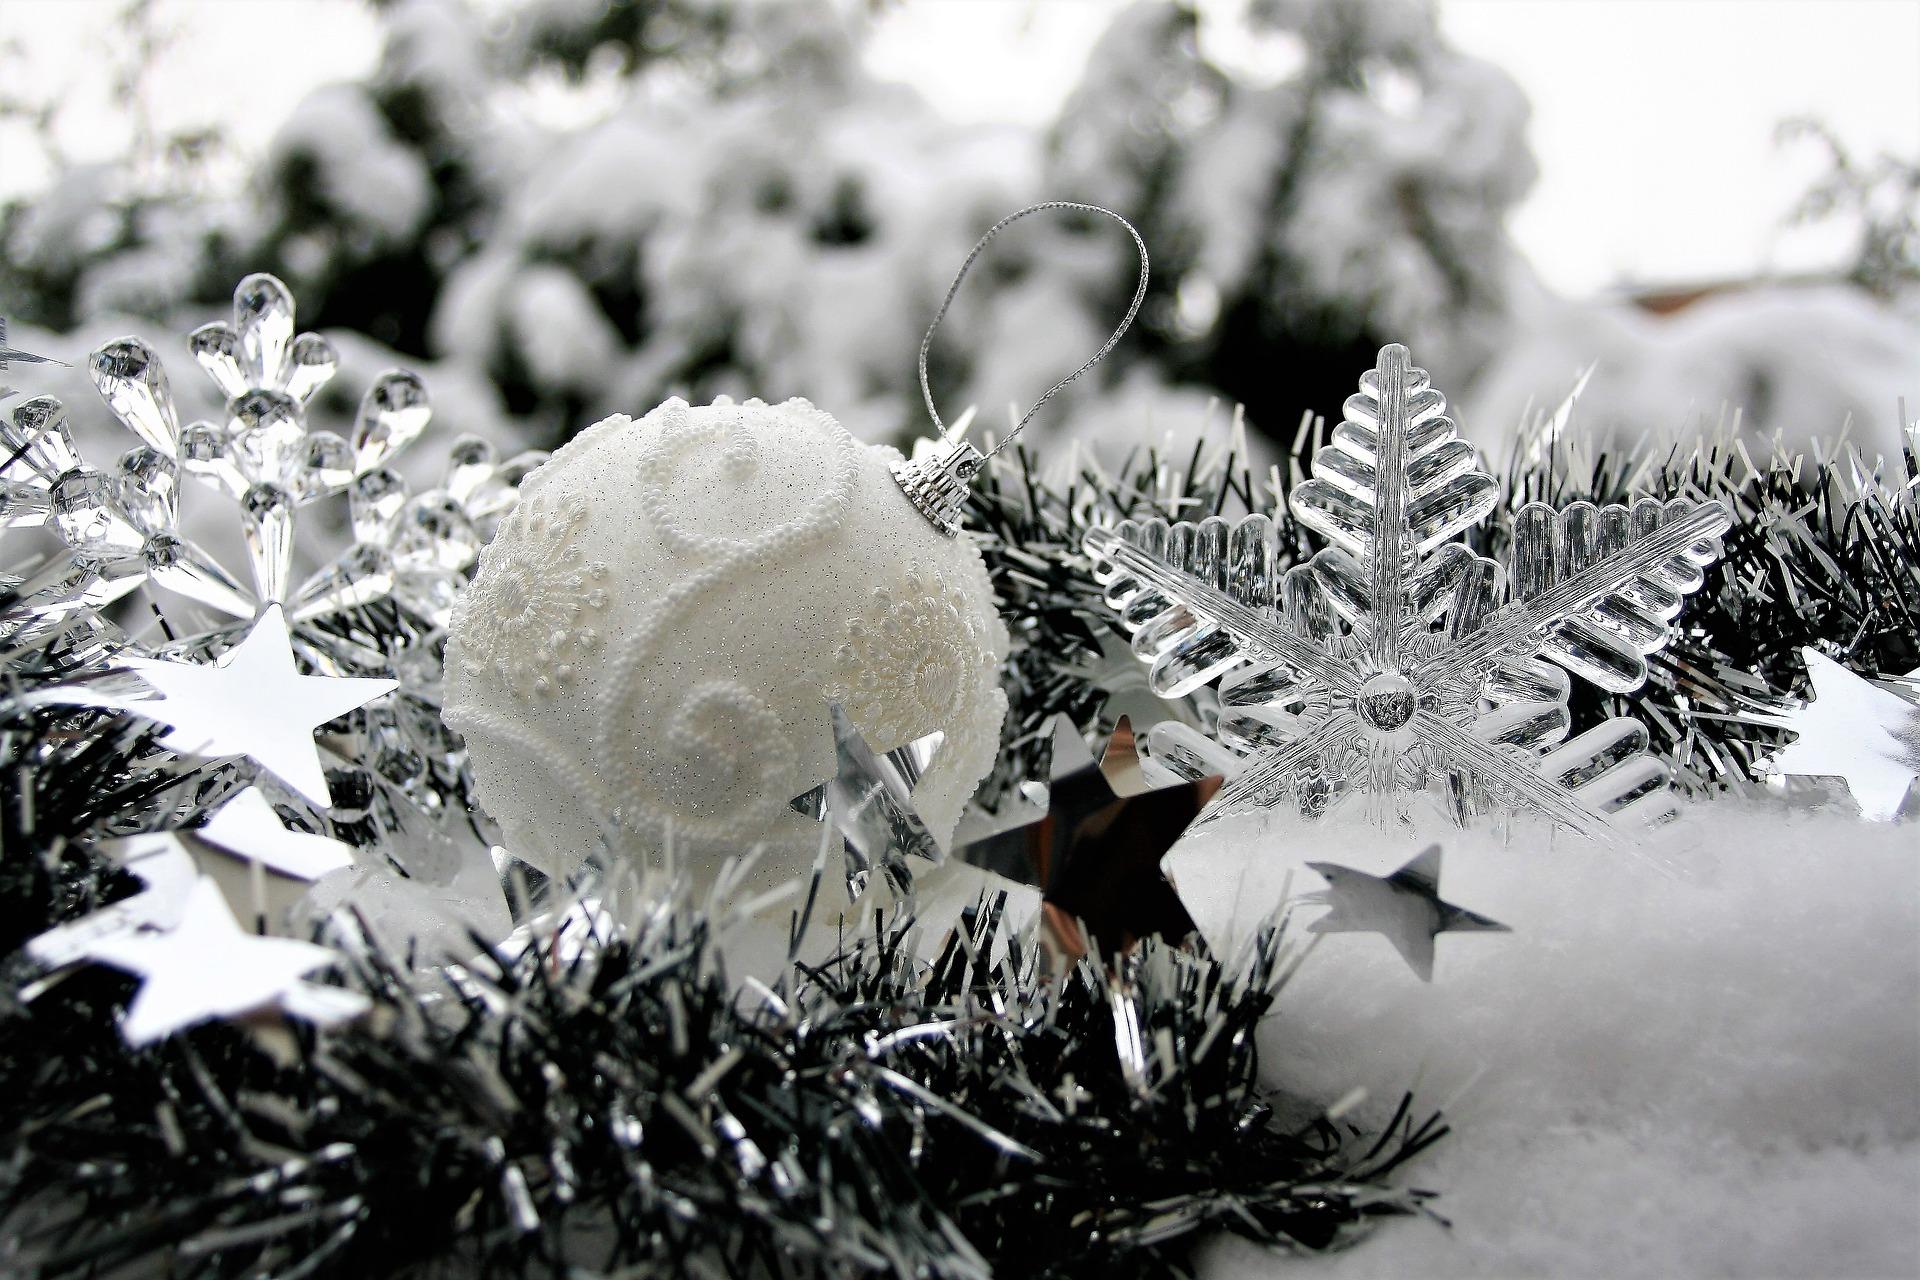 winter-3008975_1920.jpg